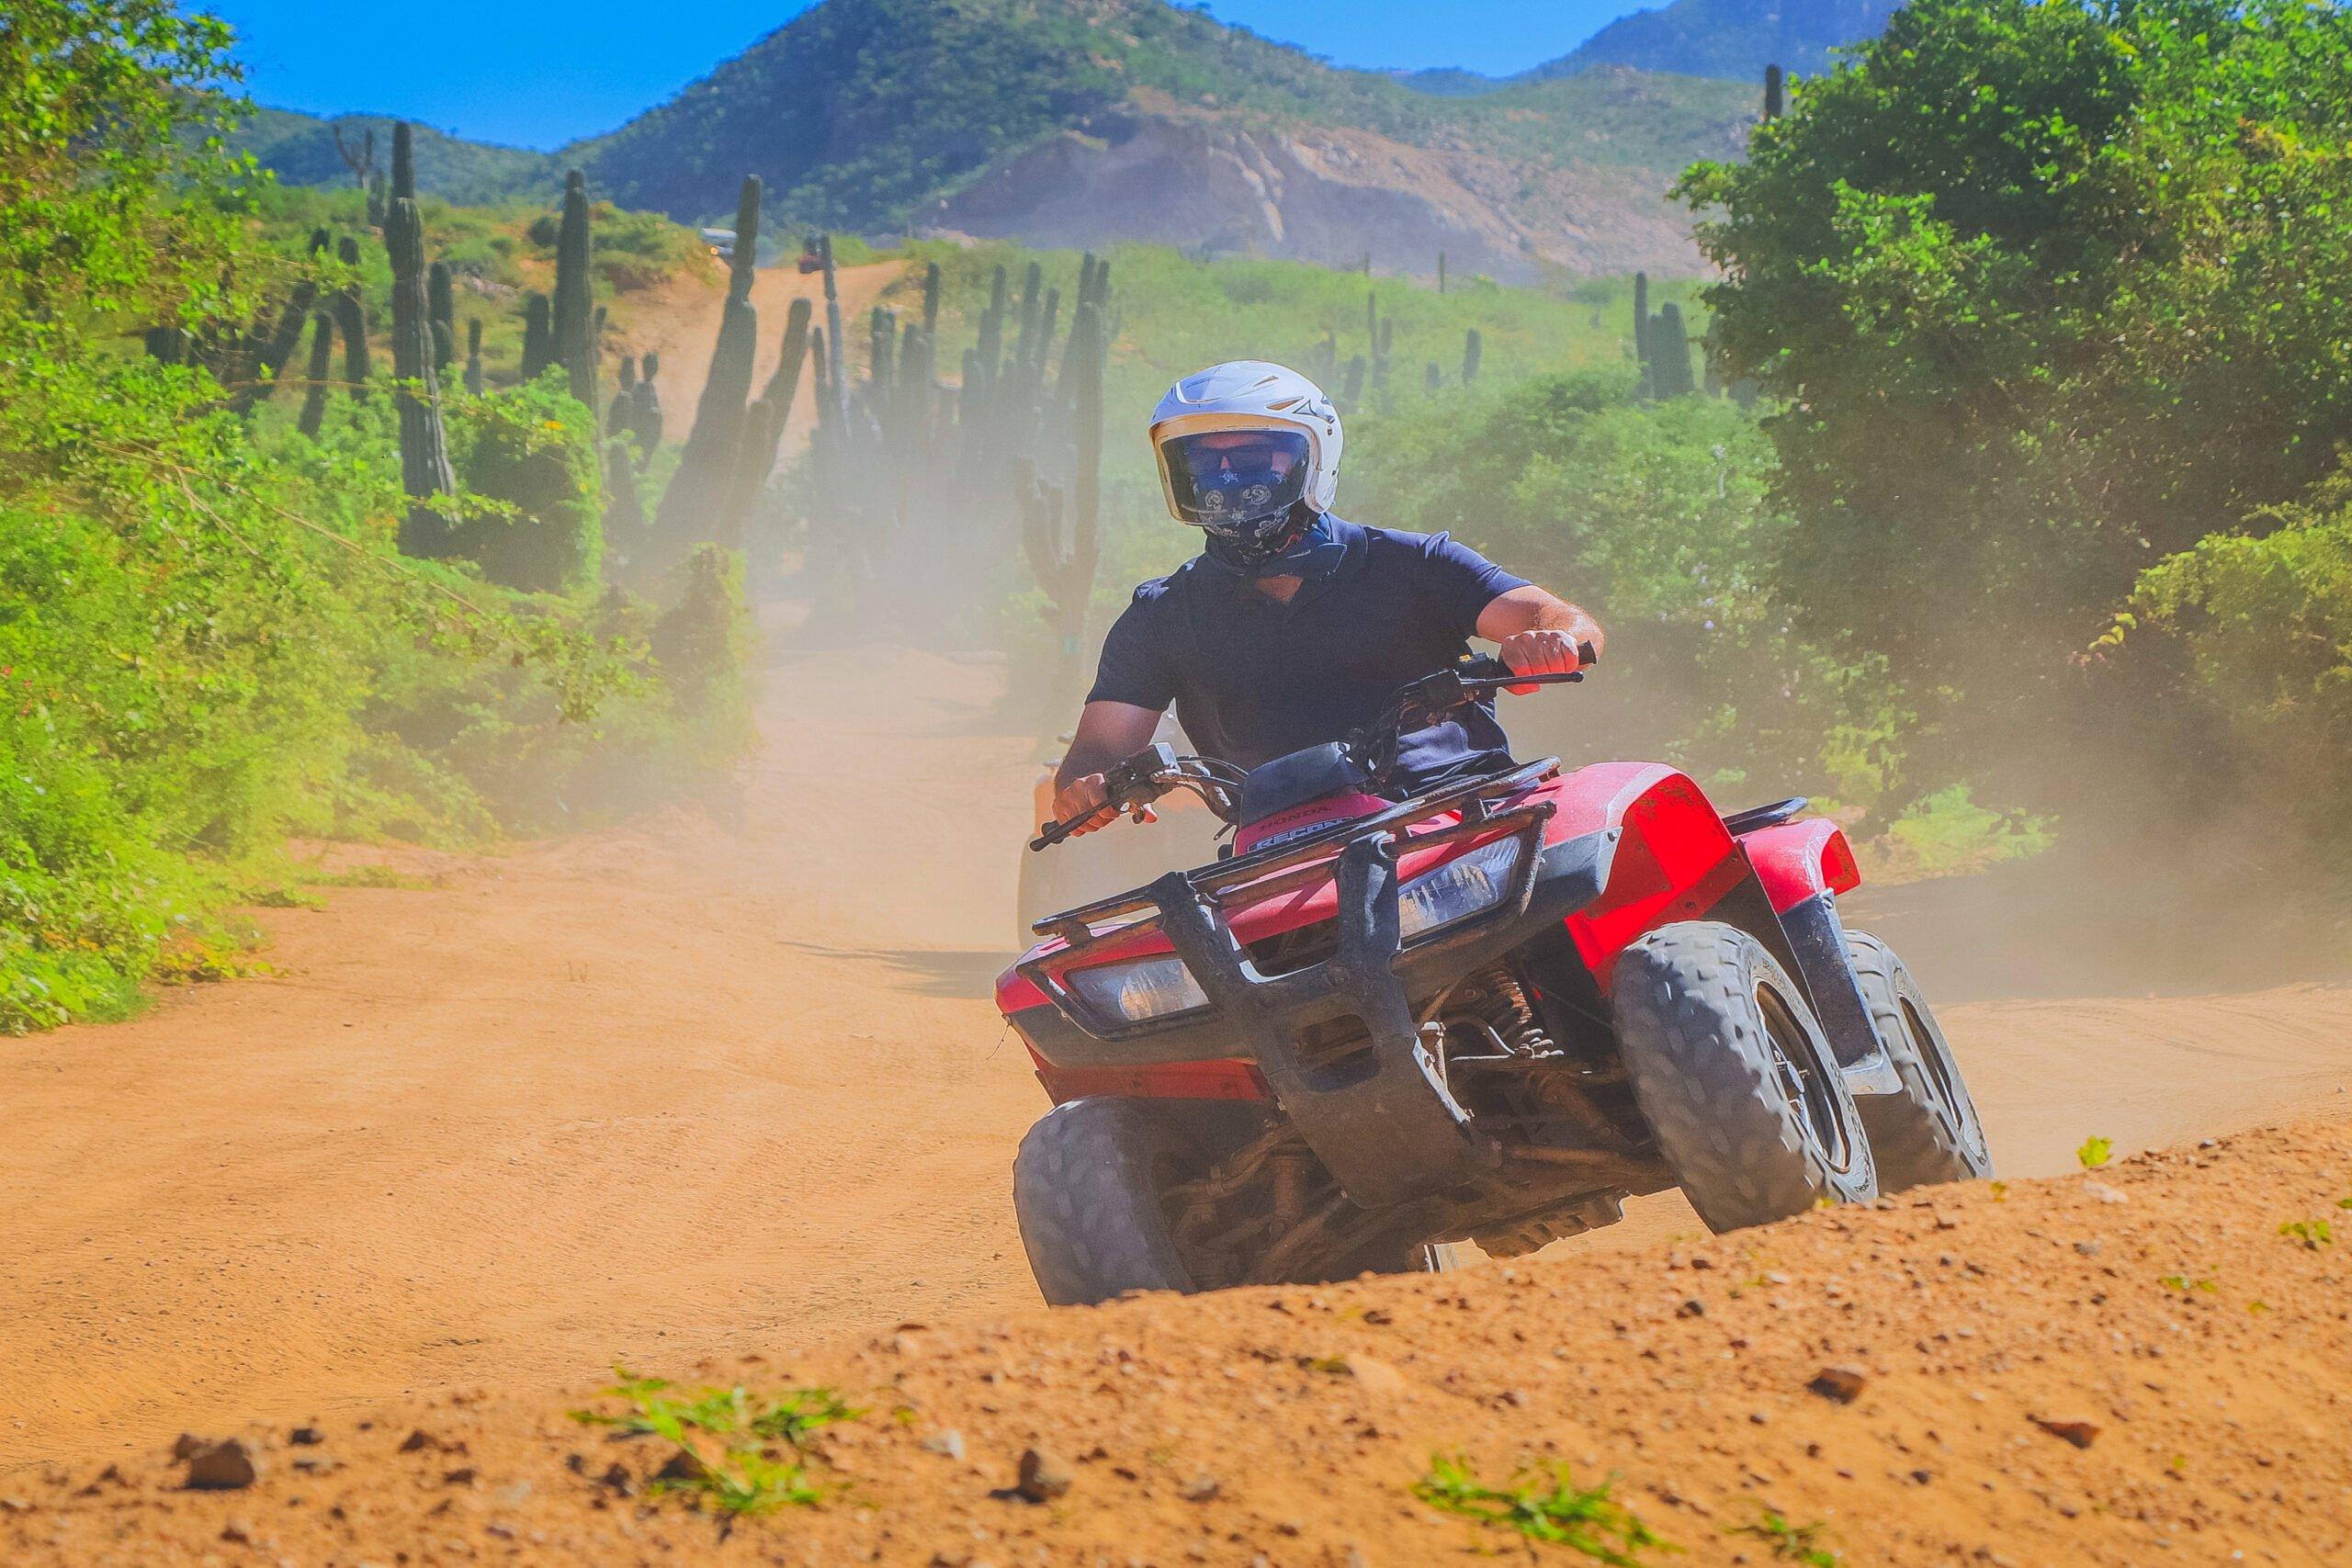 Migrino Atv Tour 8 Day Los Cabos Adventure Tour Package_54 (1)